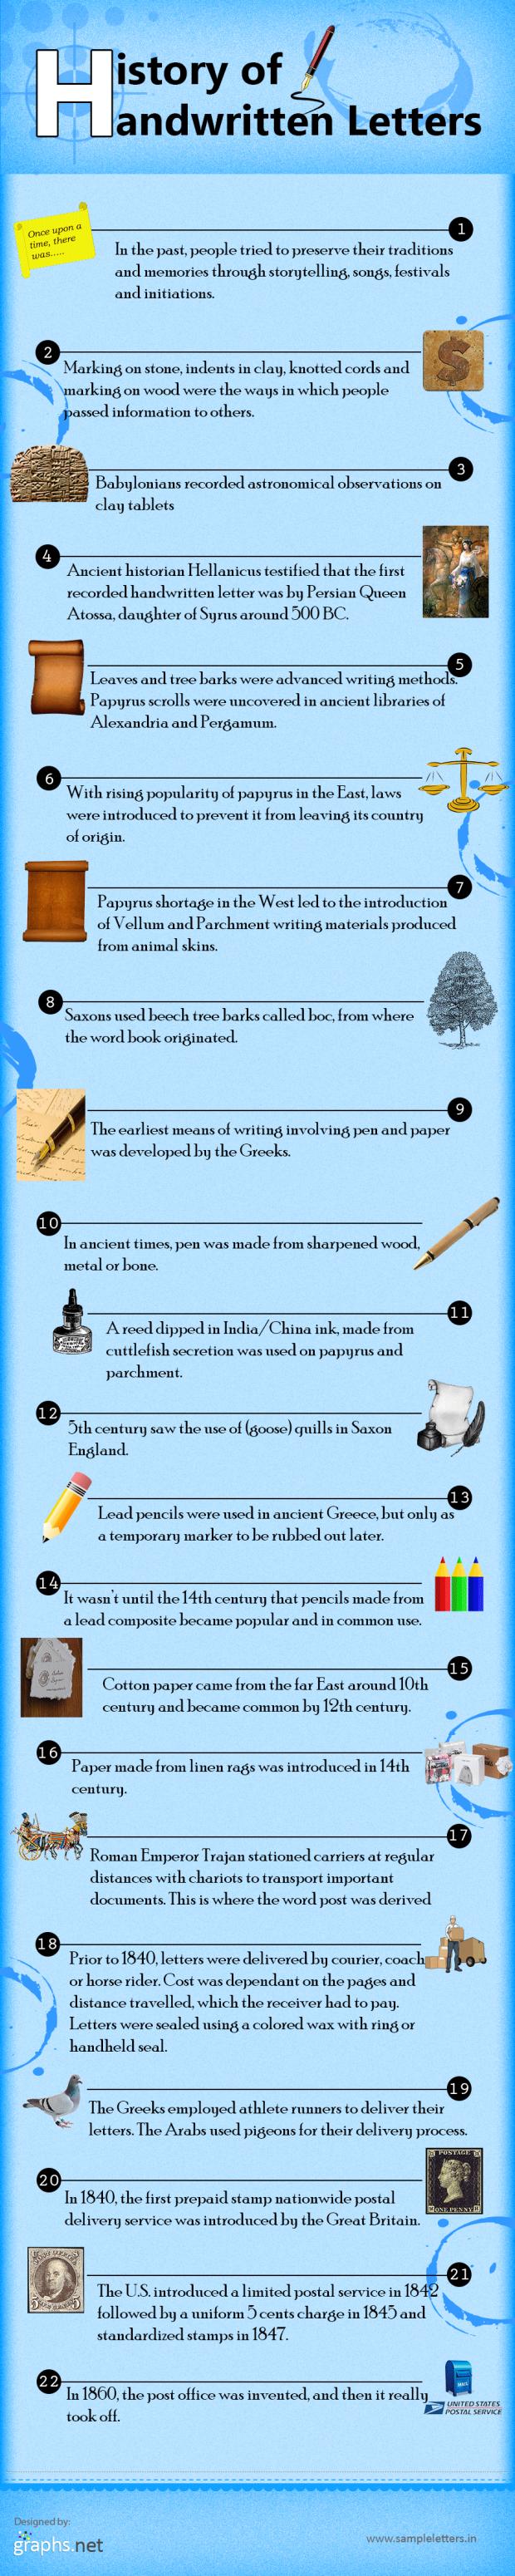 History-of-Handwritten-Letters